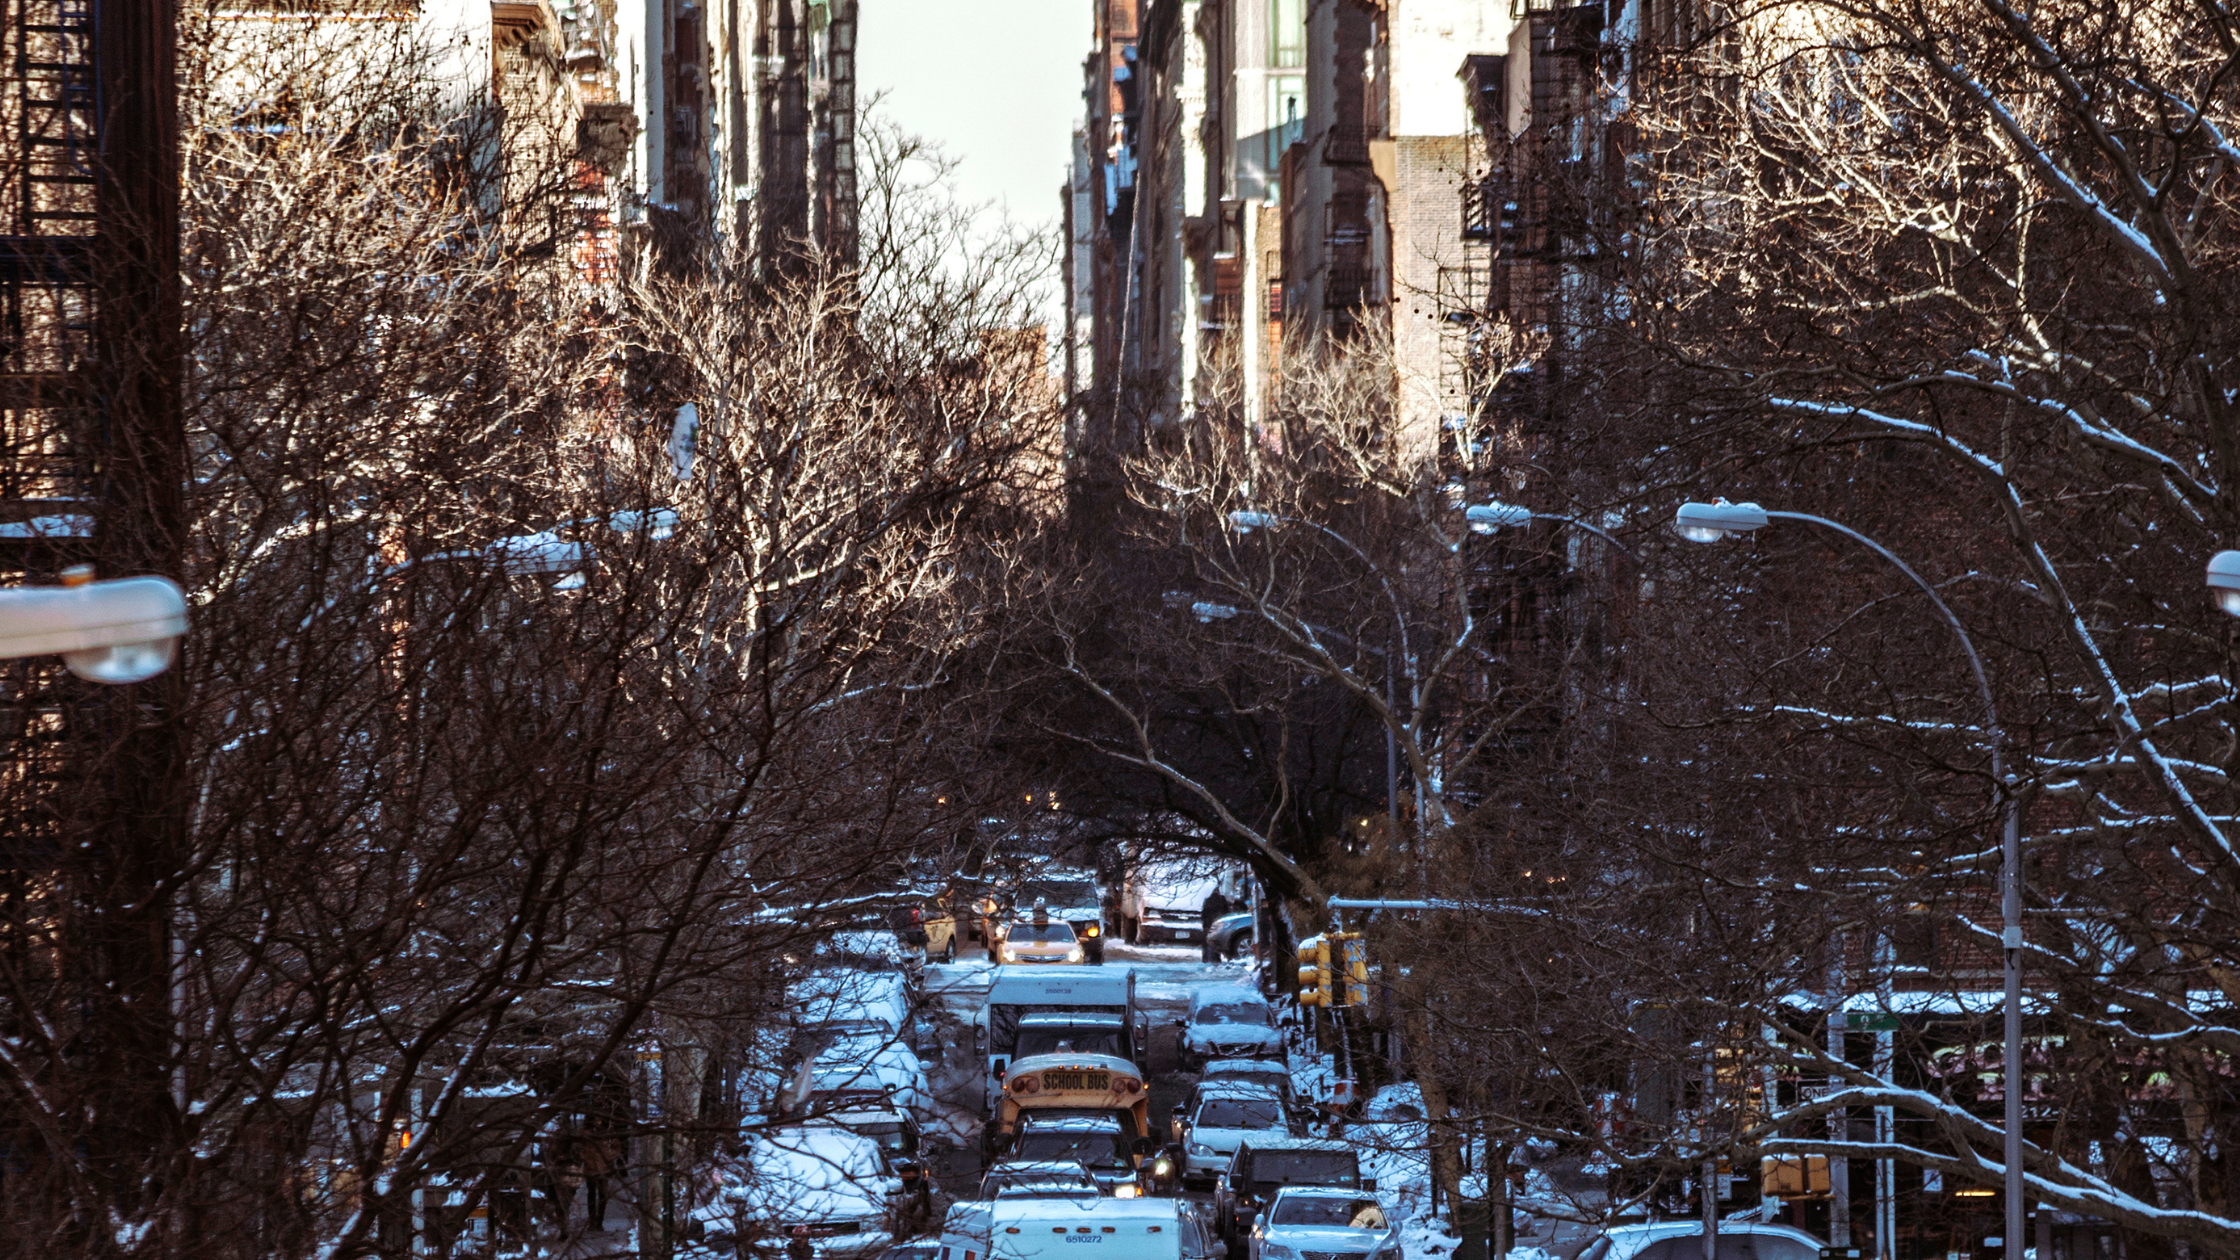 Commercial Compressor Winter